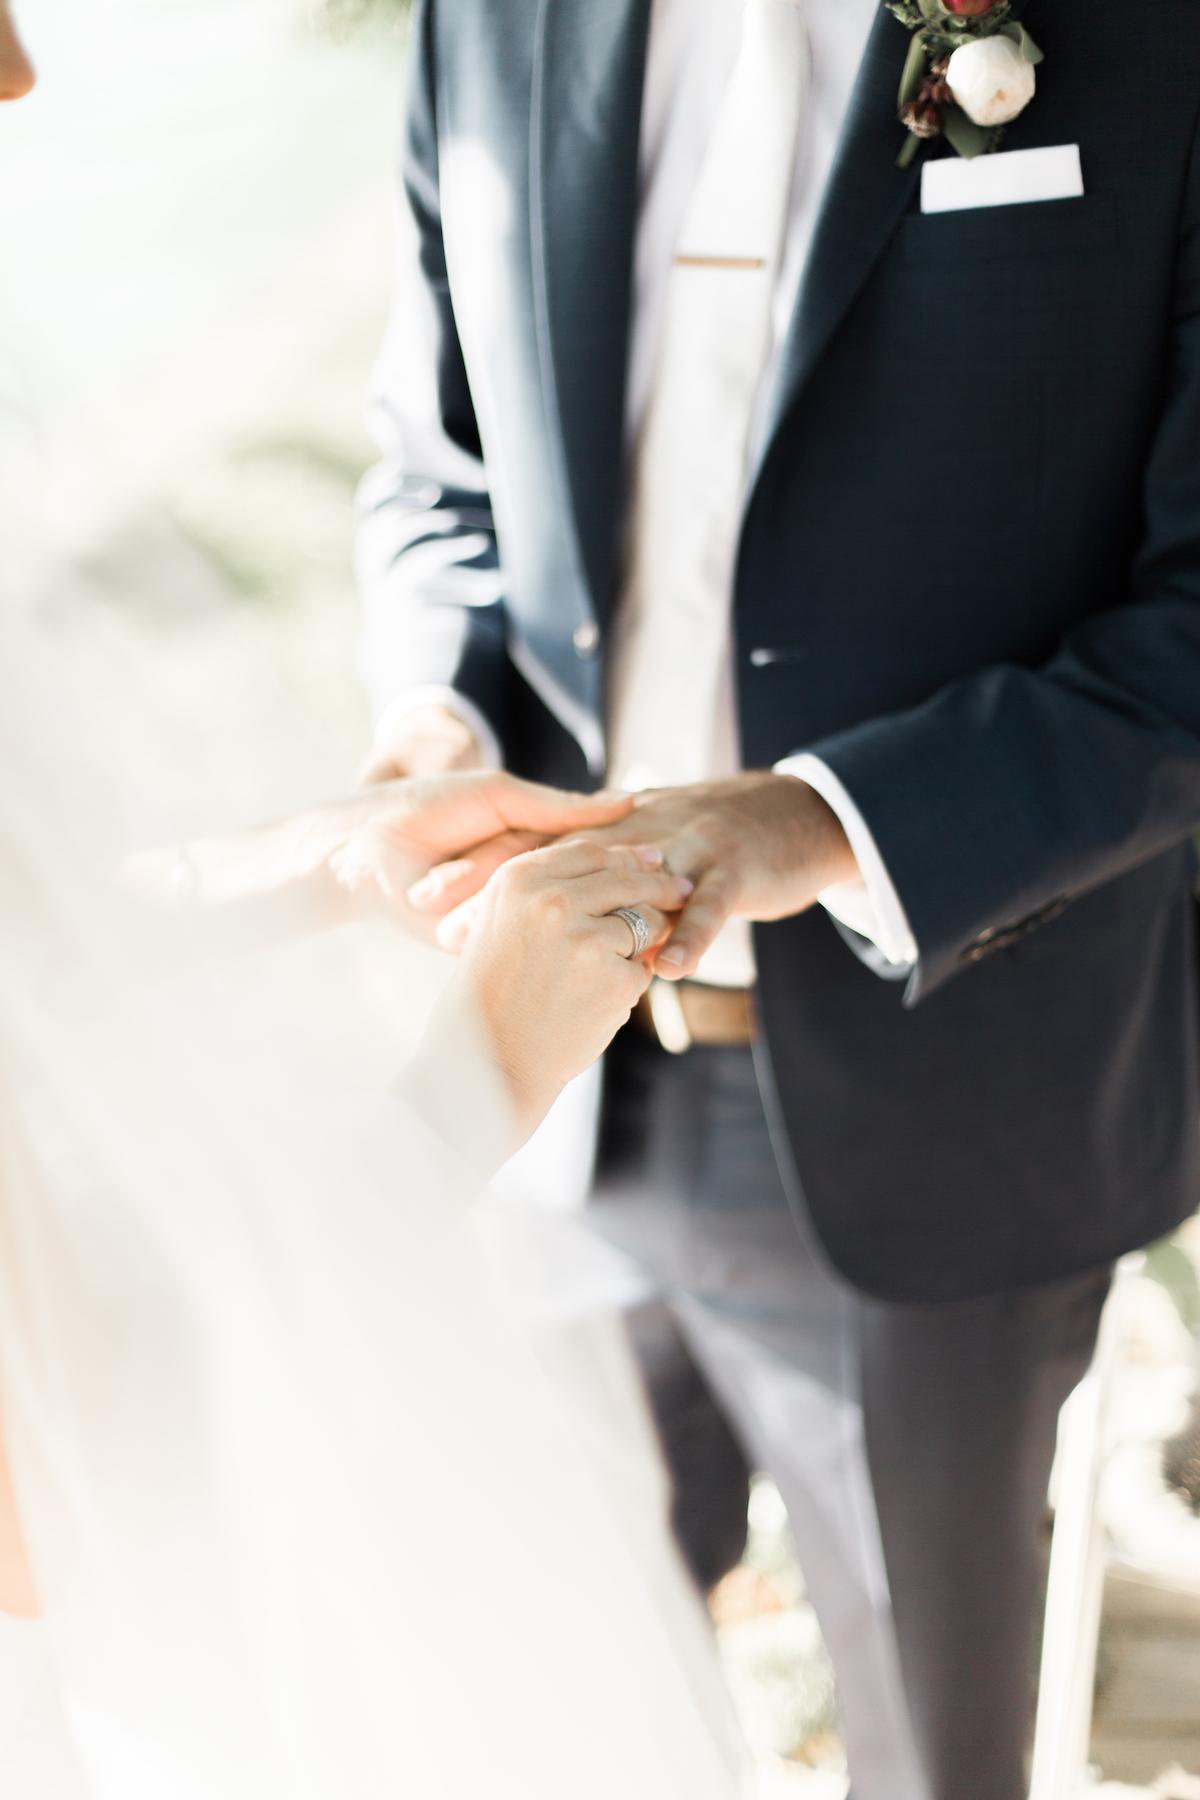 annecy-wedding-photos-165.jpg